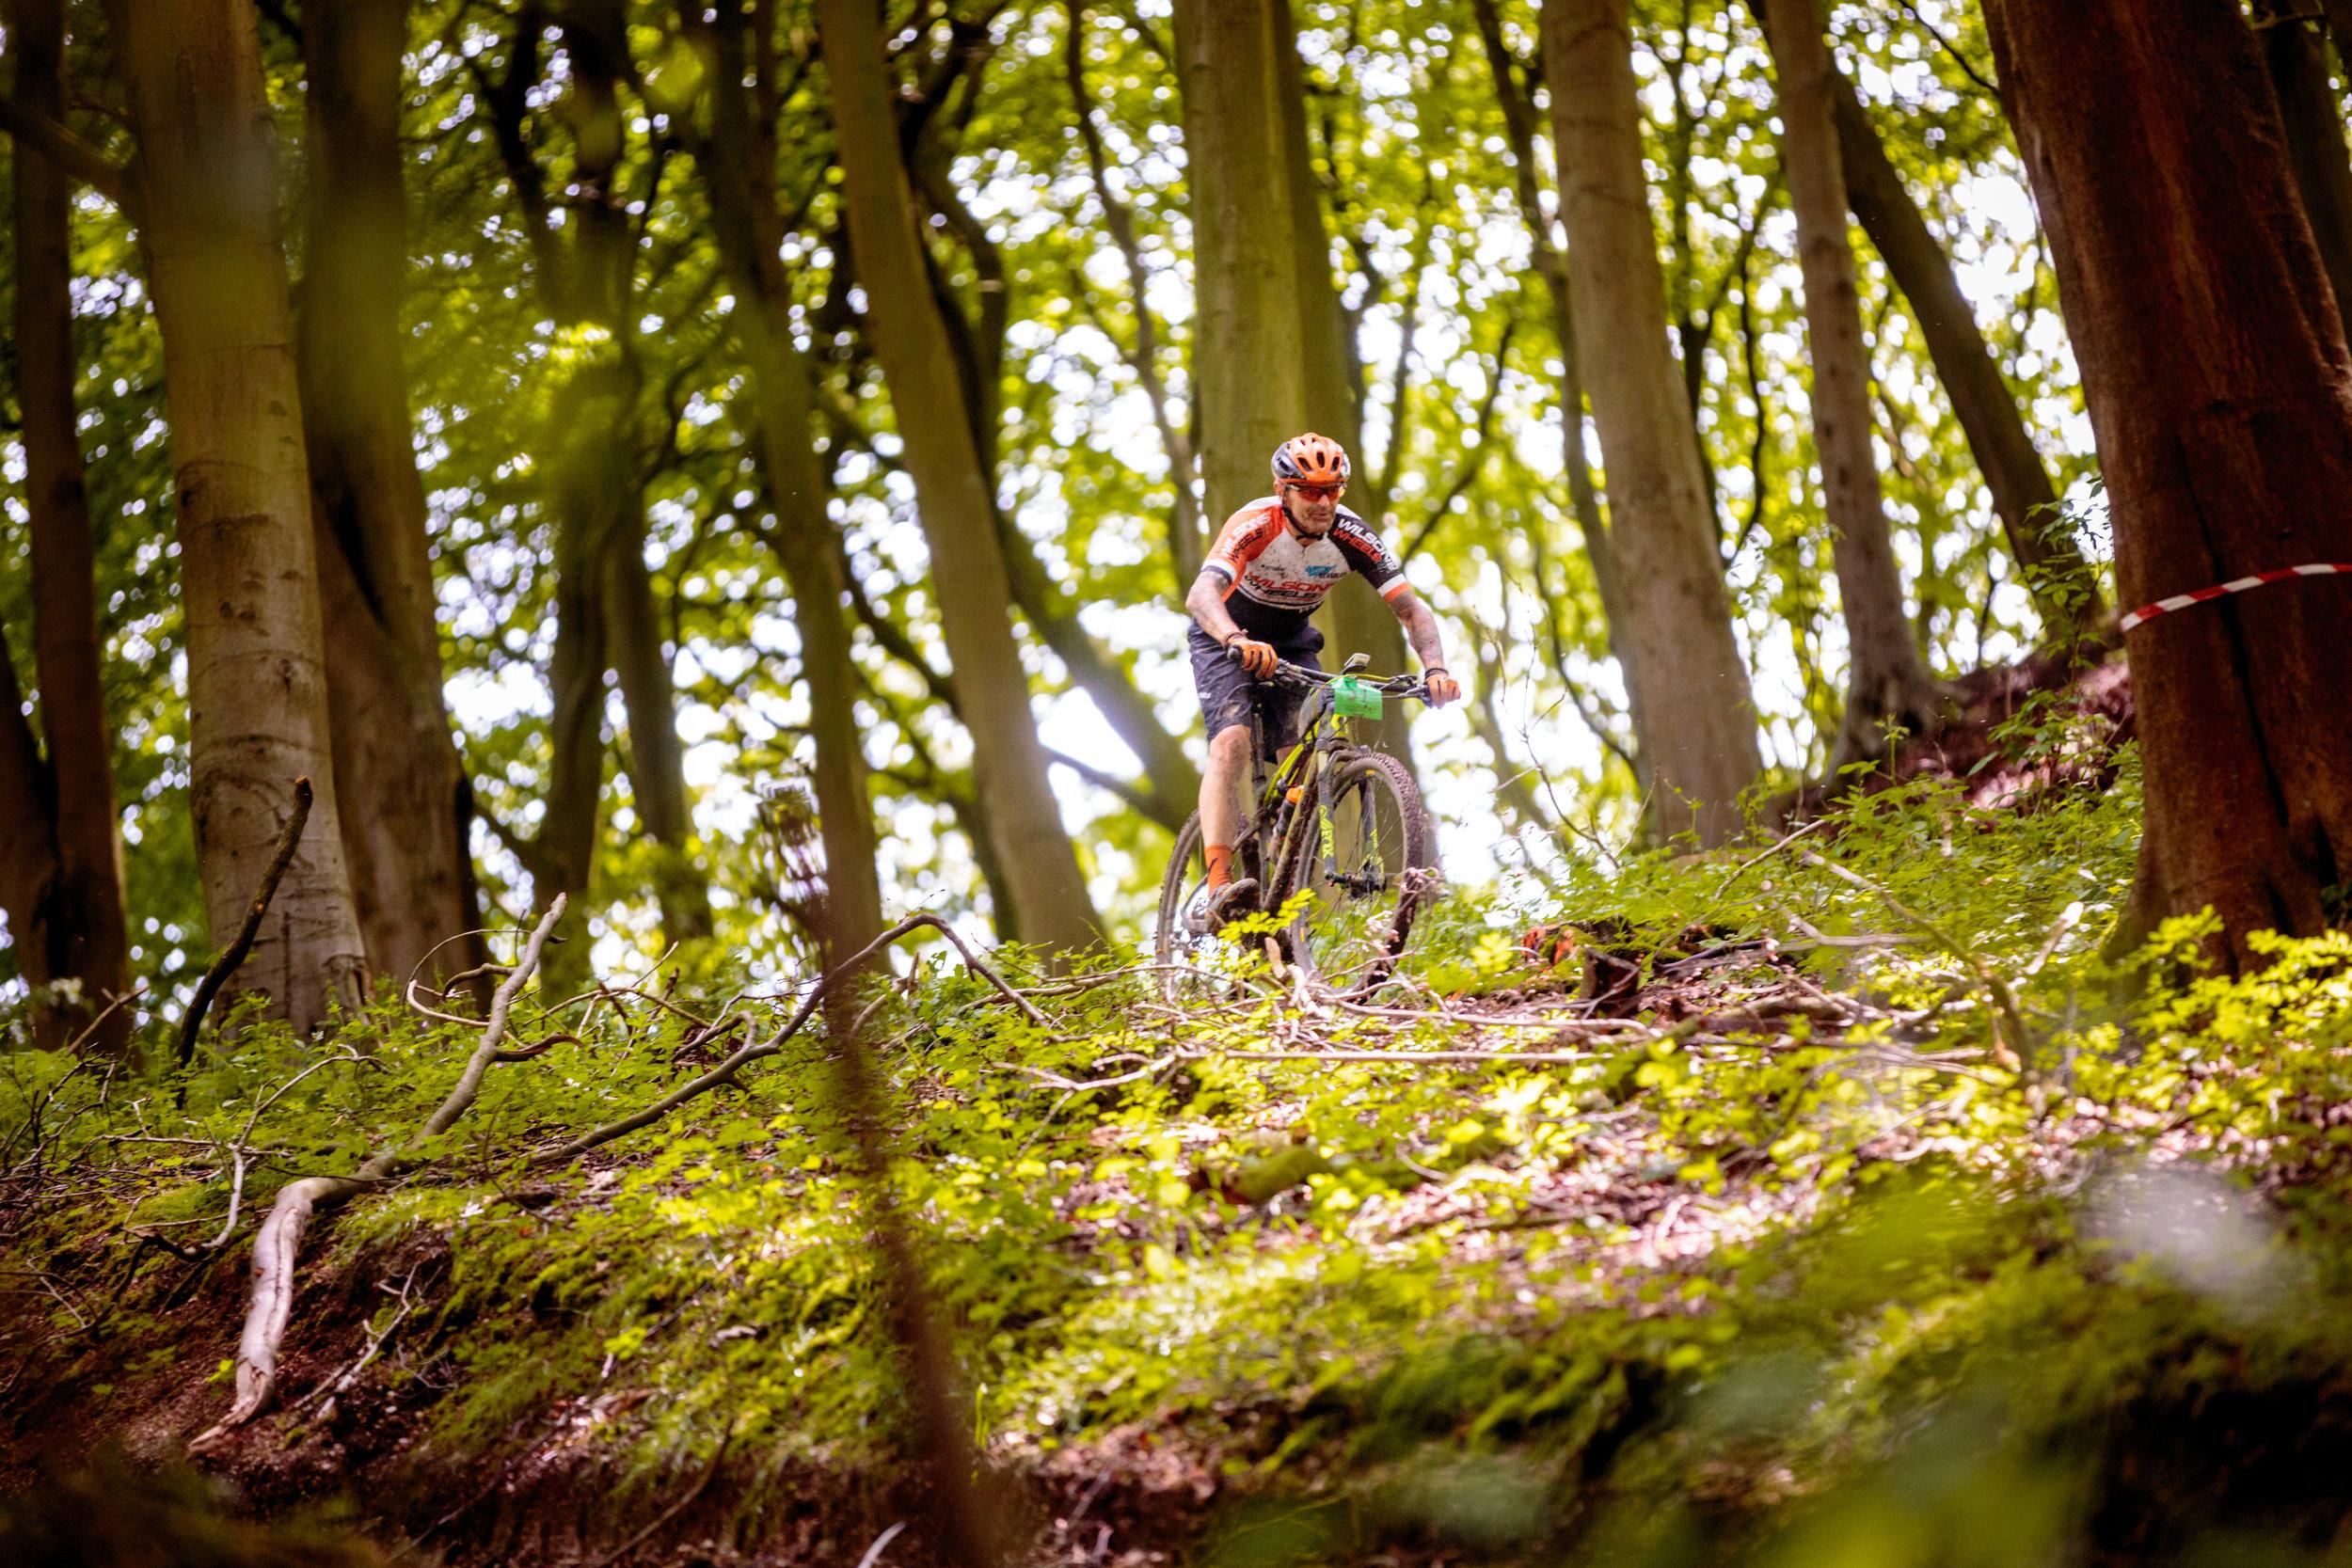 Mountain biking through the woods in Yorkshire